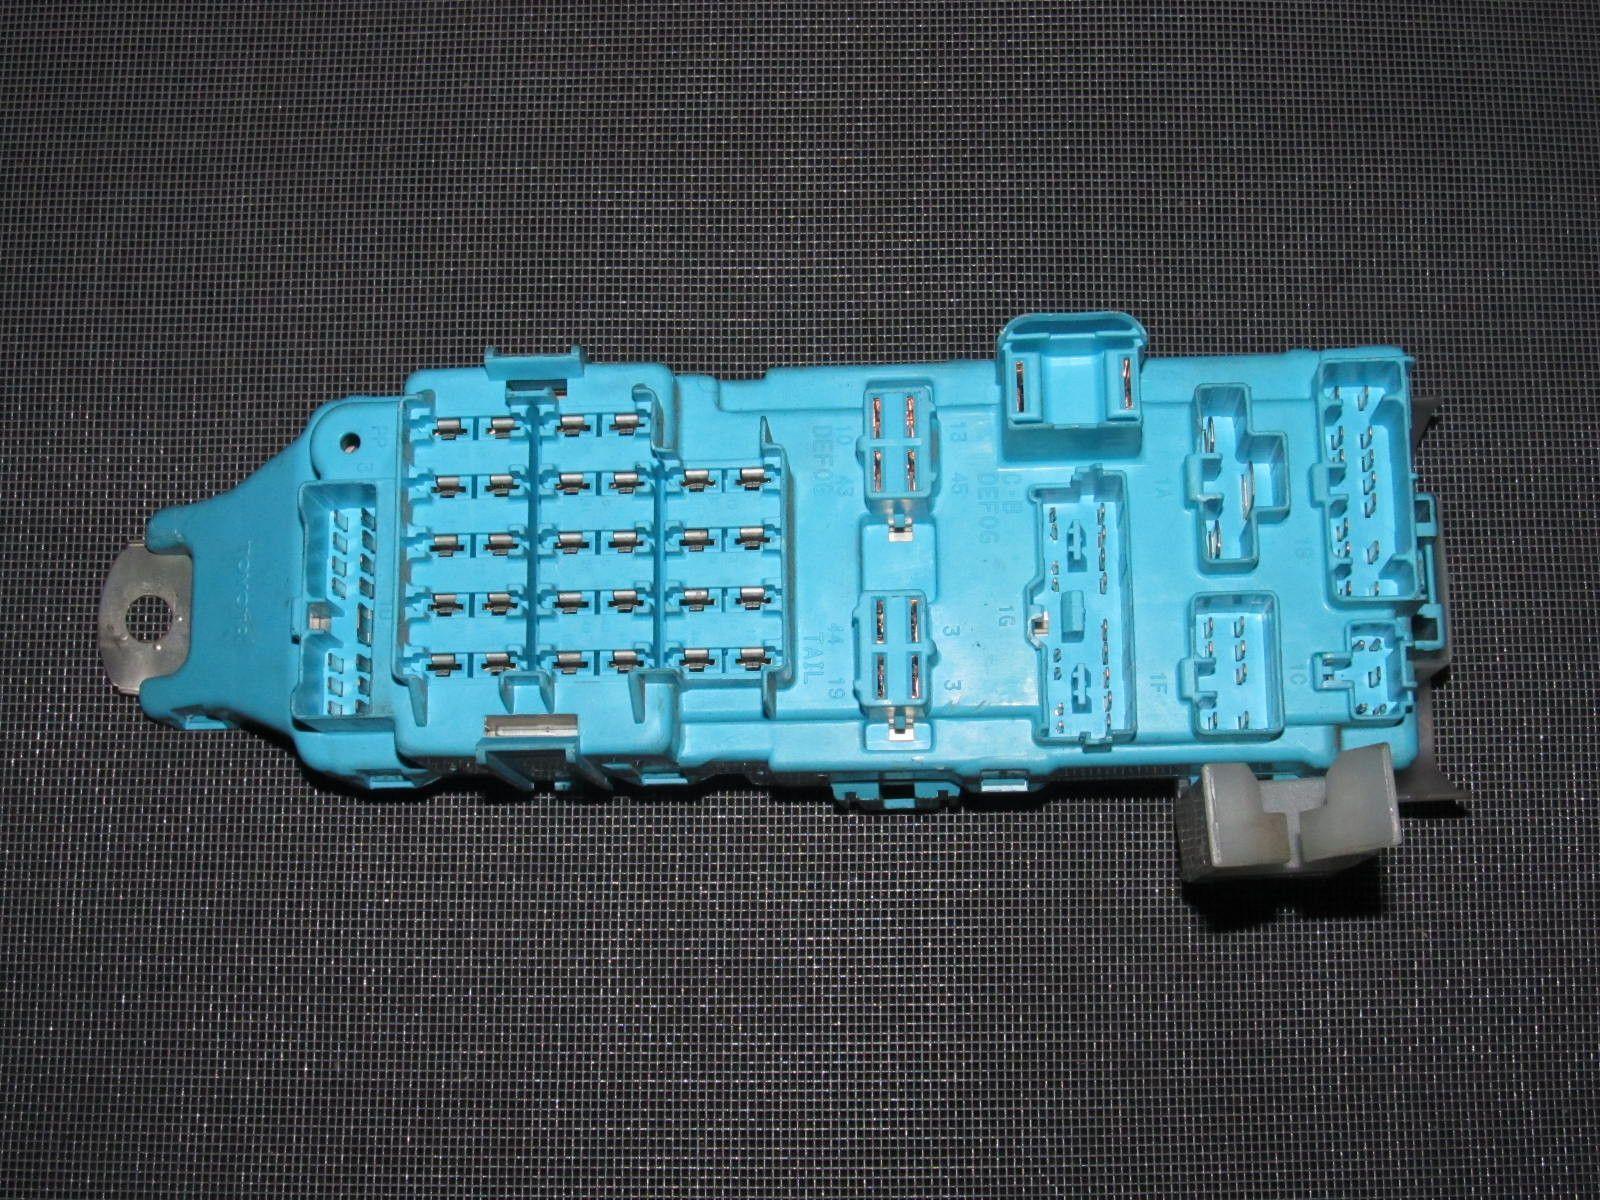 86 92 toyota supra oem interior fuse box products toyota supra 86 92 toyota supra oem interior fuse box